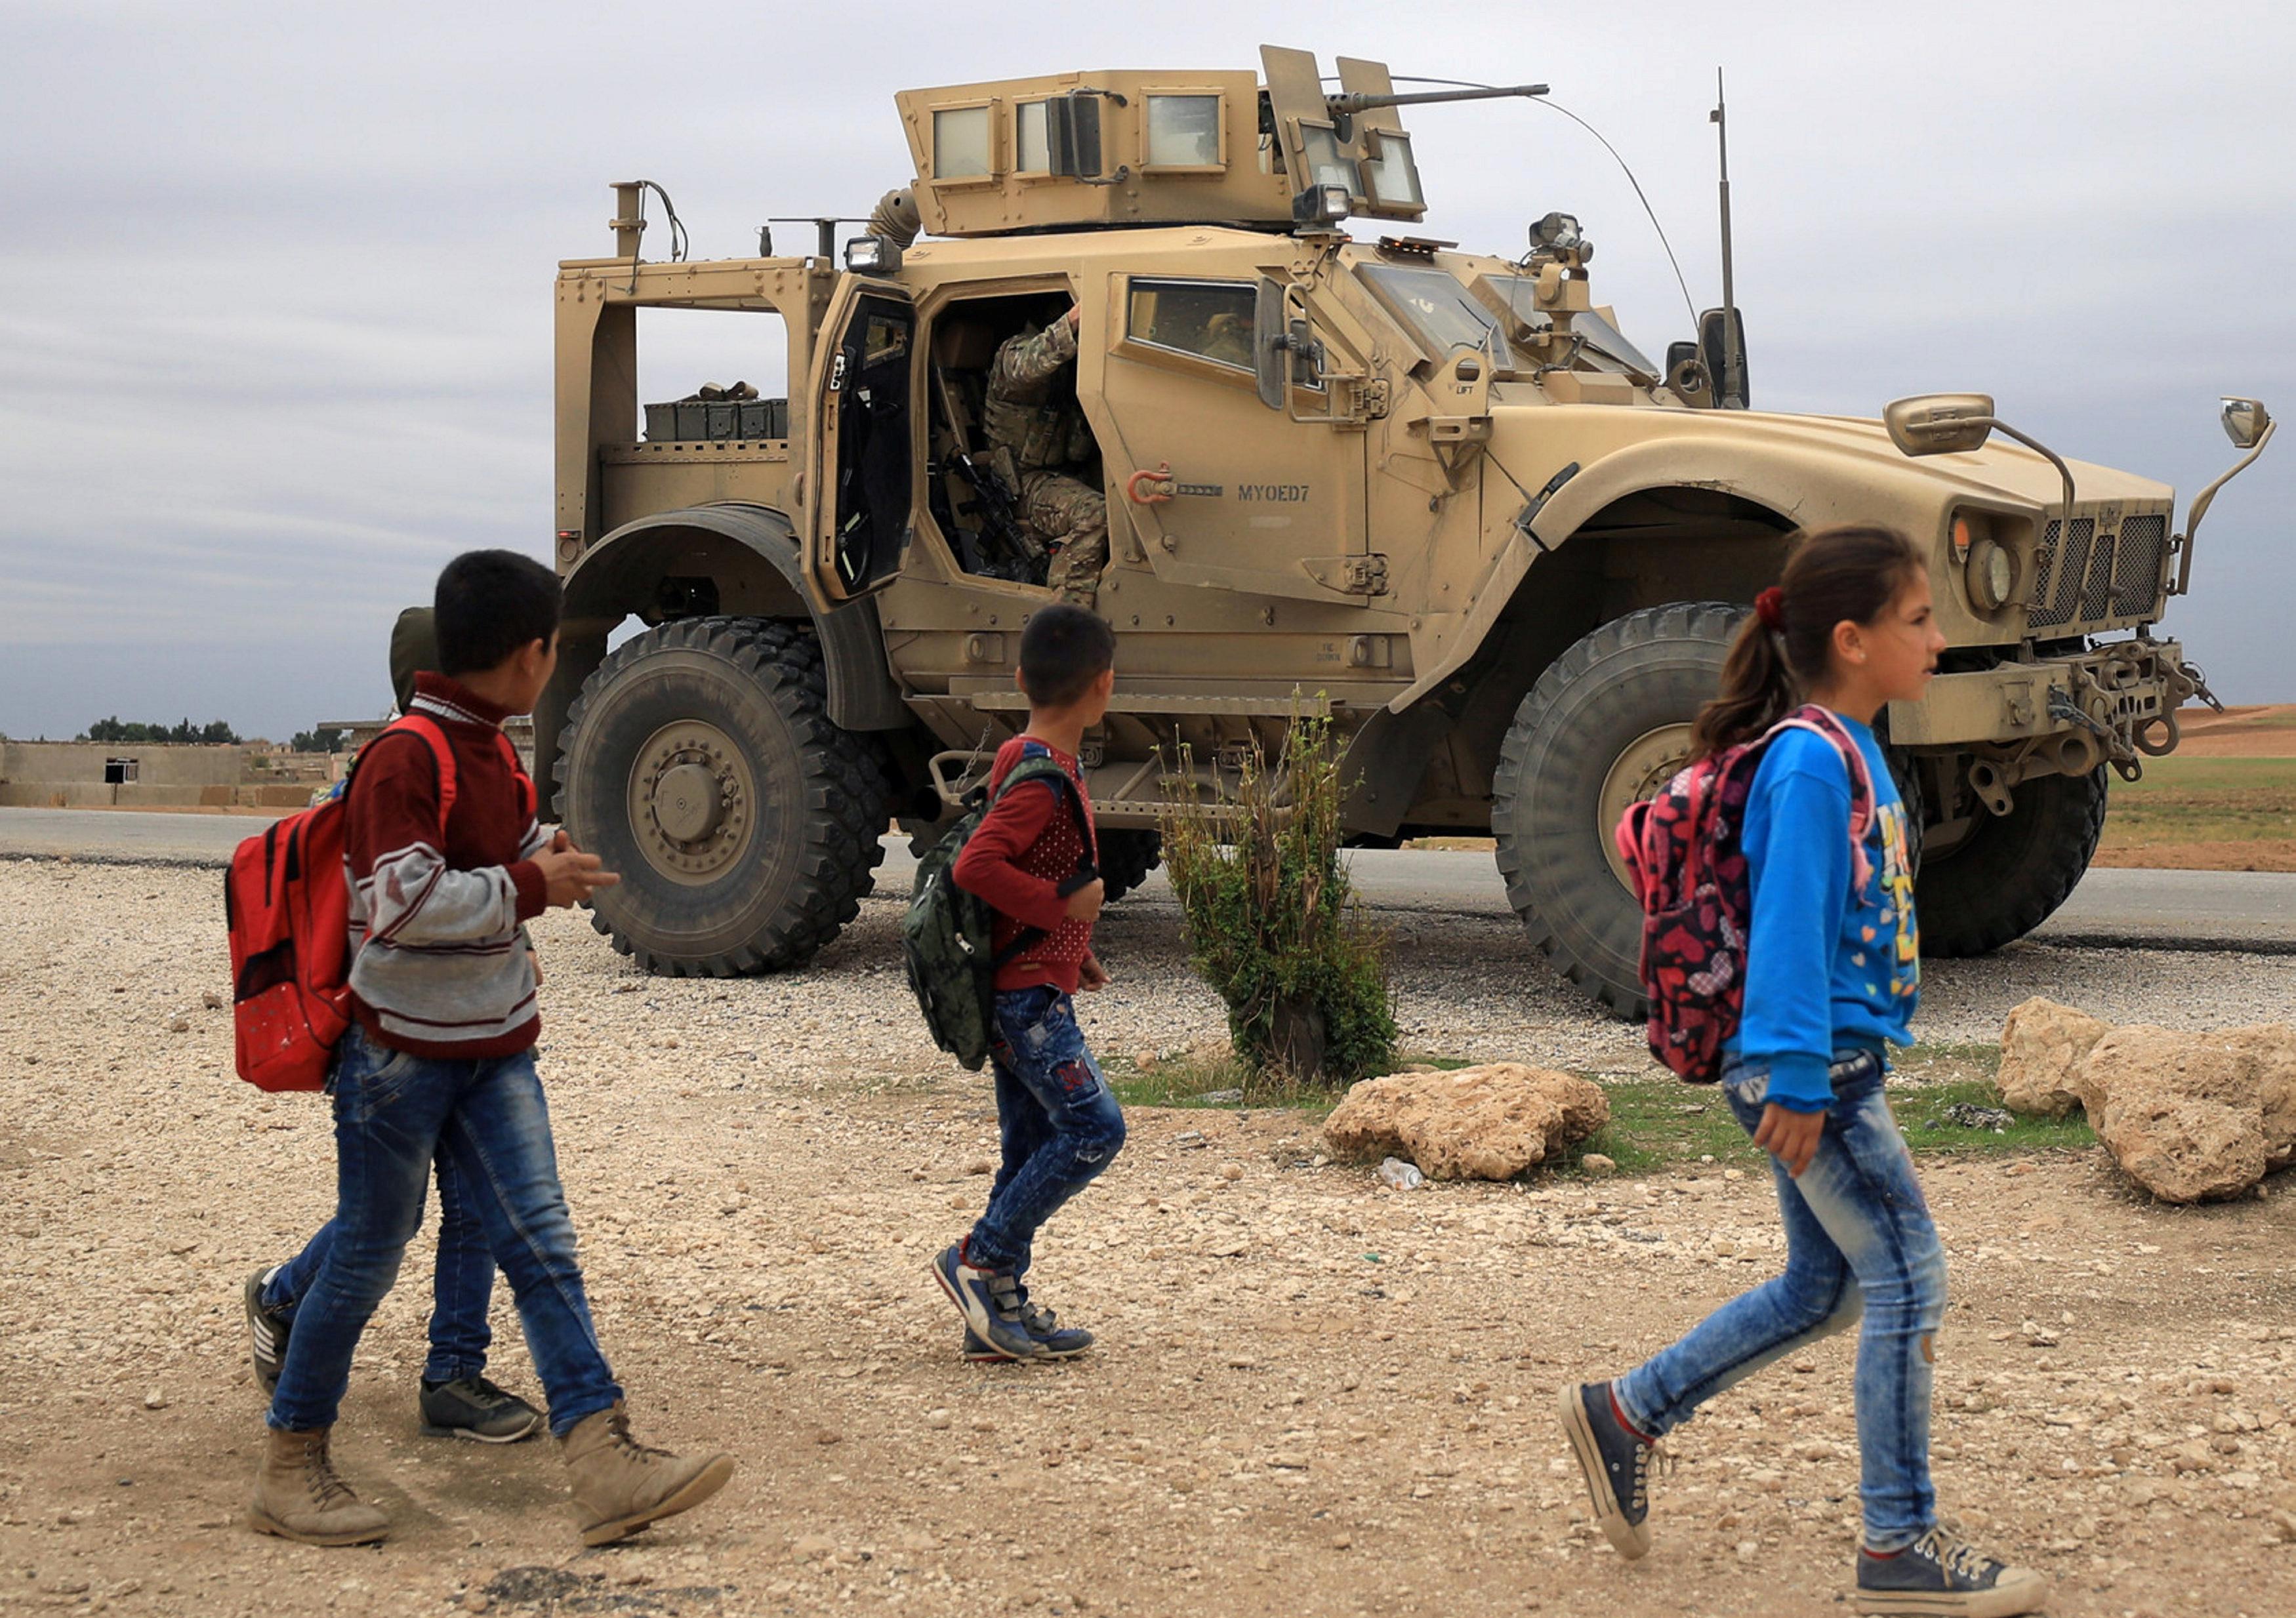 FILE PHOTO: Syrian schoolchildren walk as U.S. troops patrol near Turkish border in Hasakah, Syria Nov. 4, 2018. REUTERS/Rodi Said/File Photo